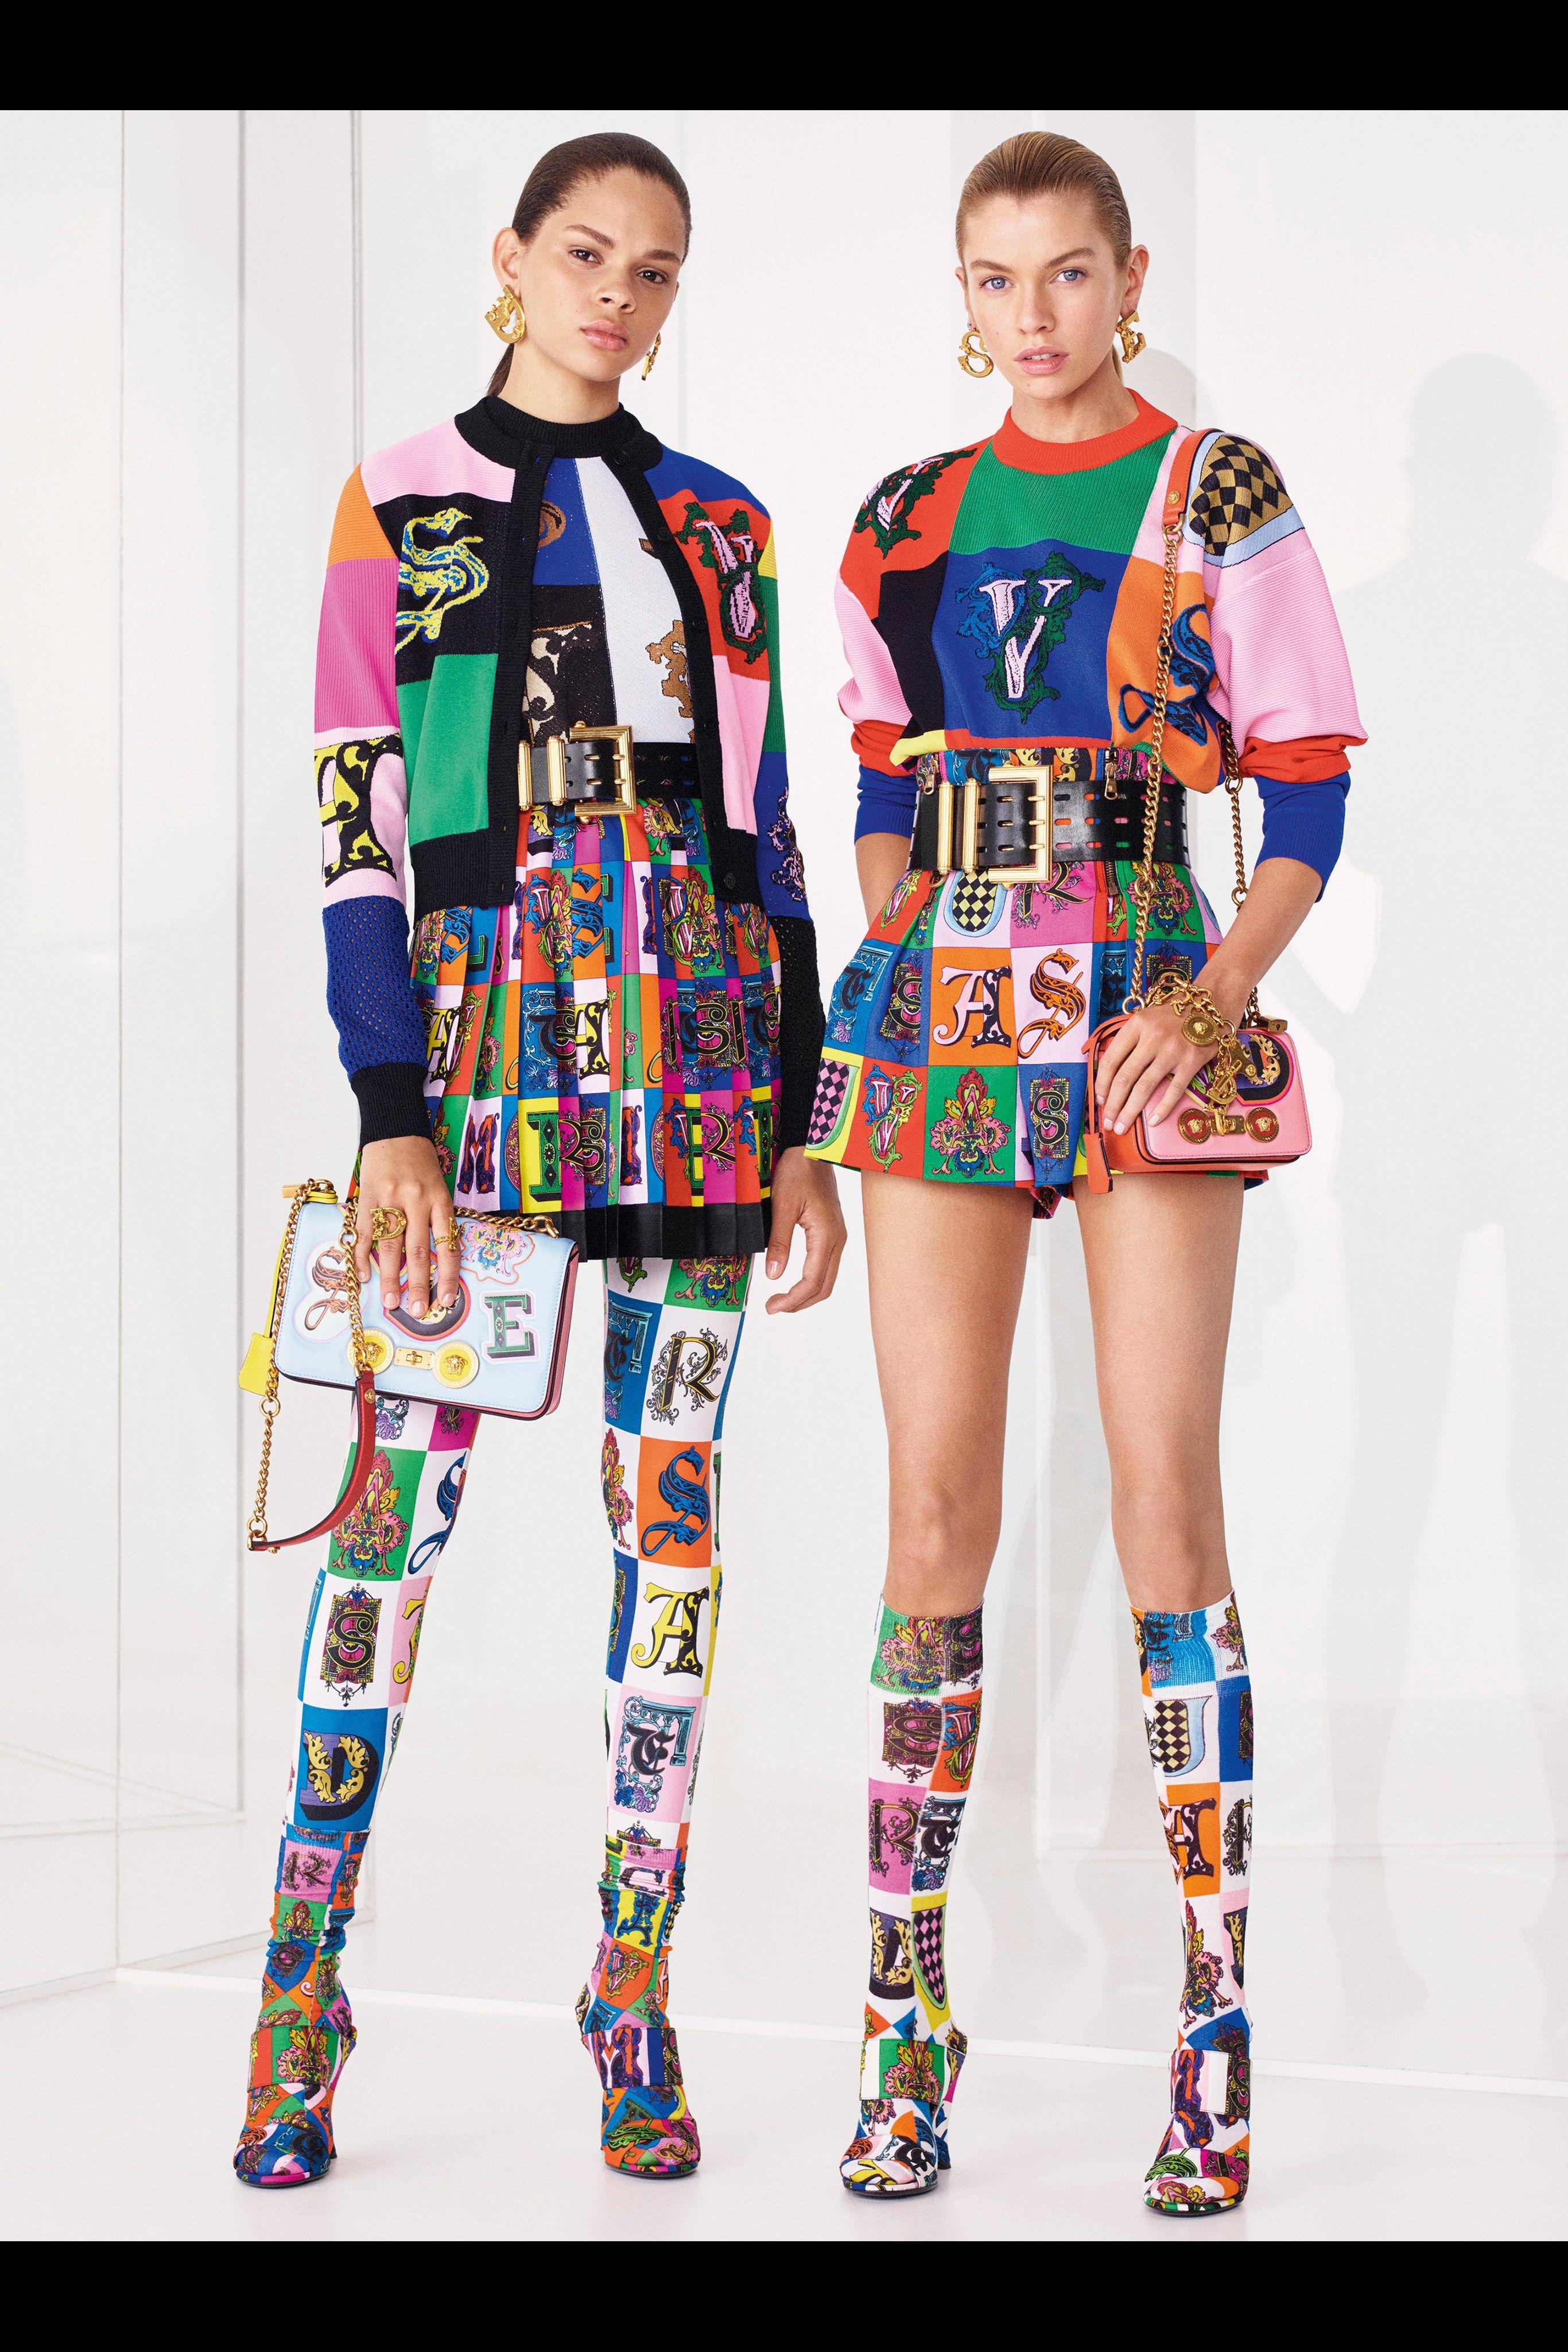 6ffa634dda16 Versace Resort 2019 Fashion Show   Design inspo   Pinterest ...